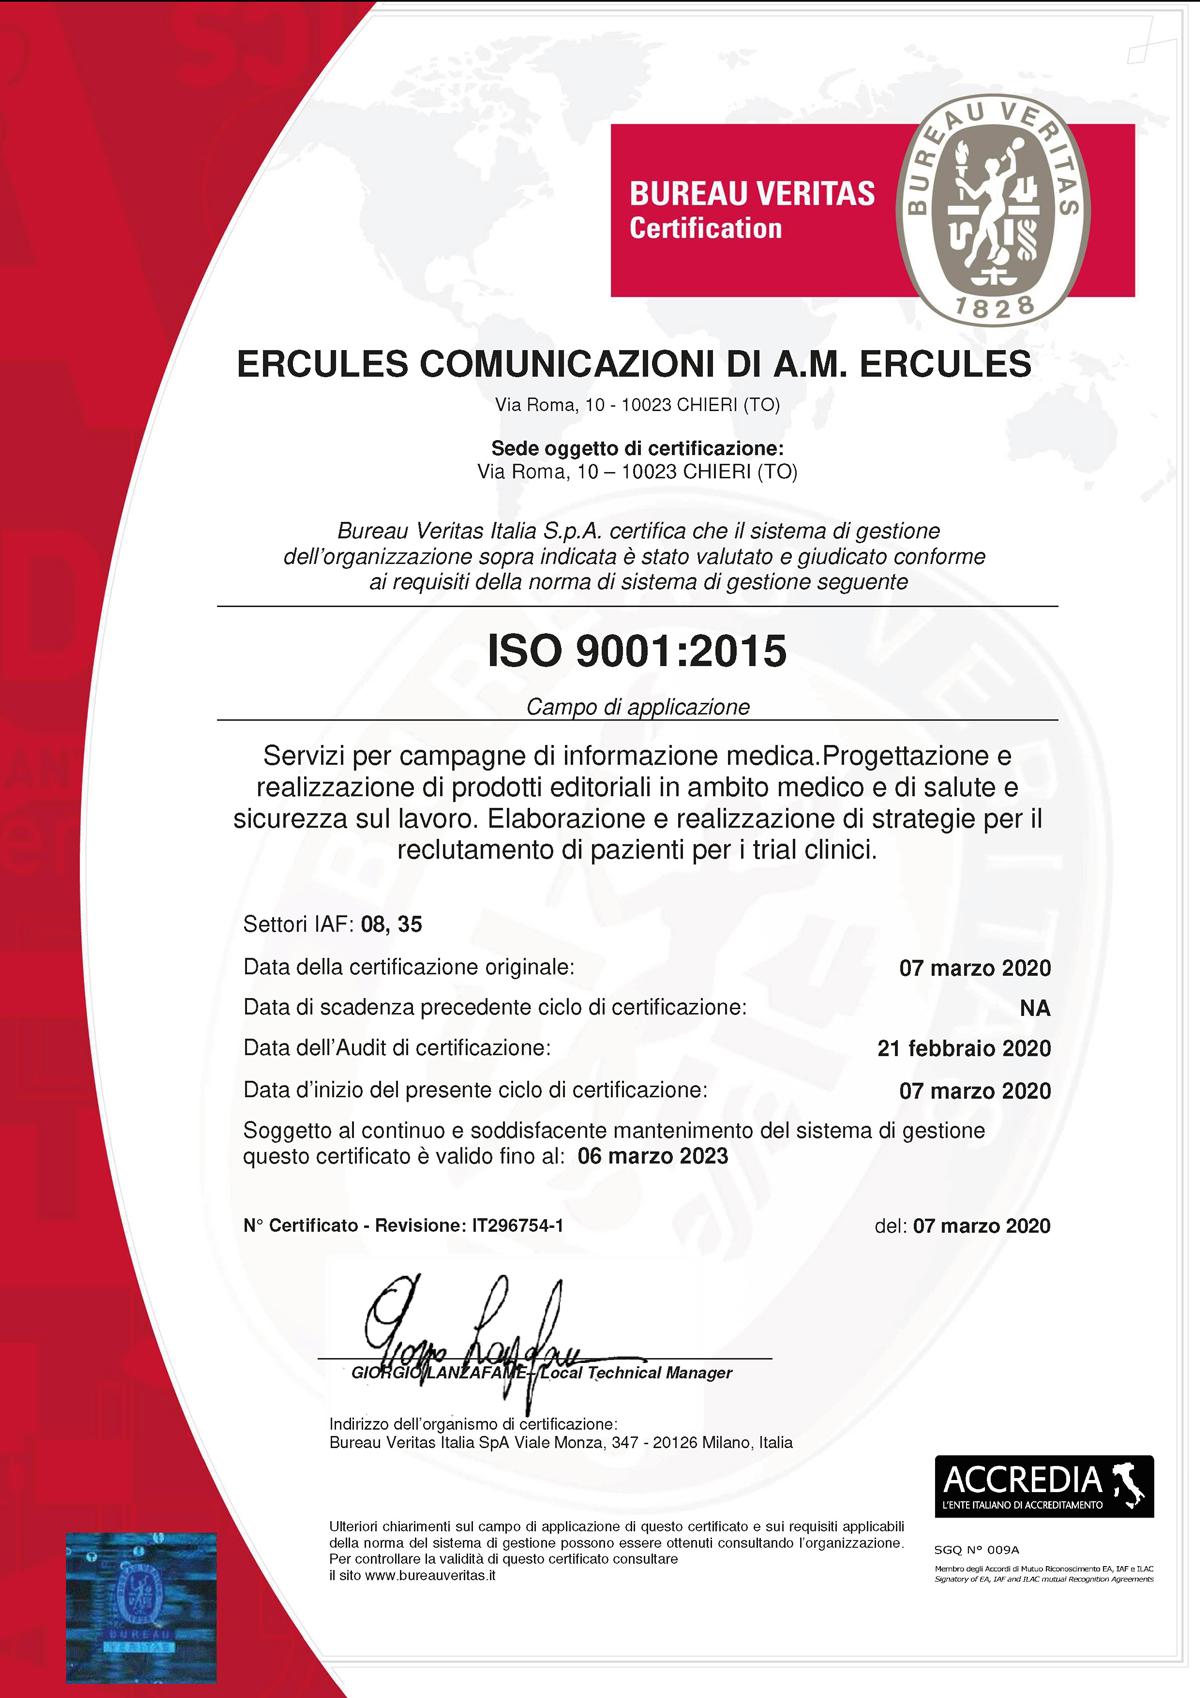 Ercules ISO 9001 certificate